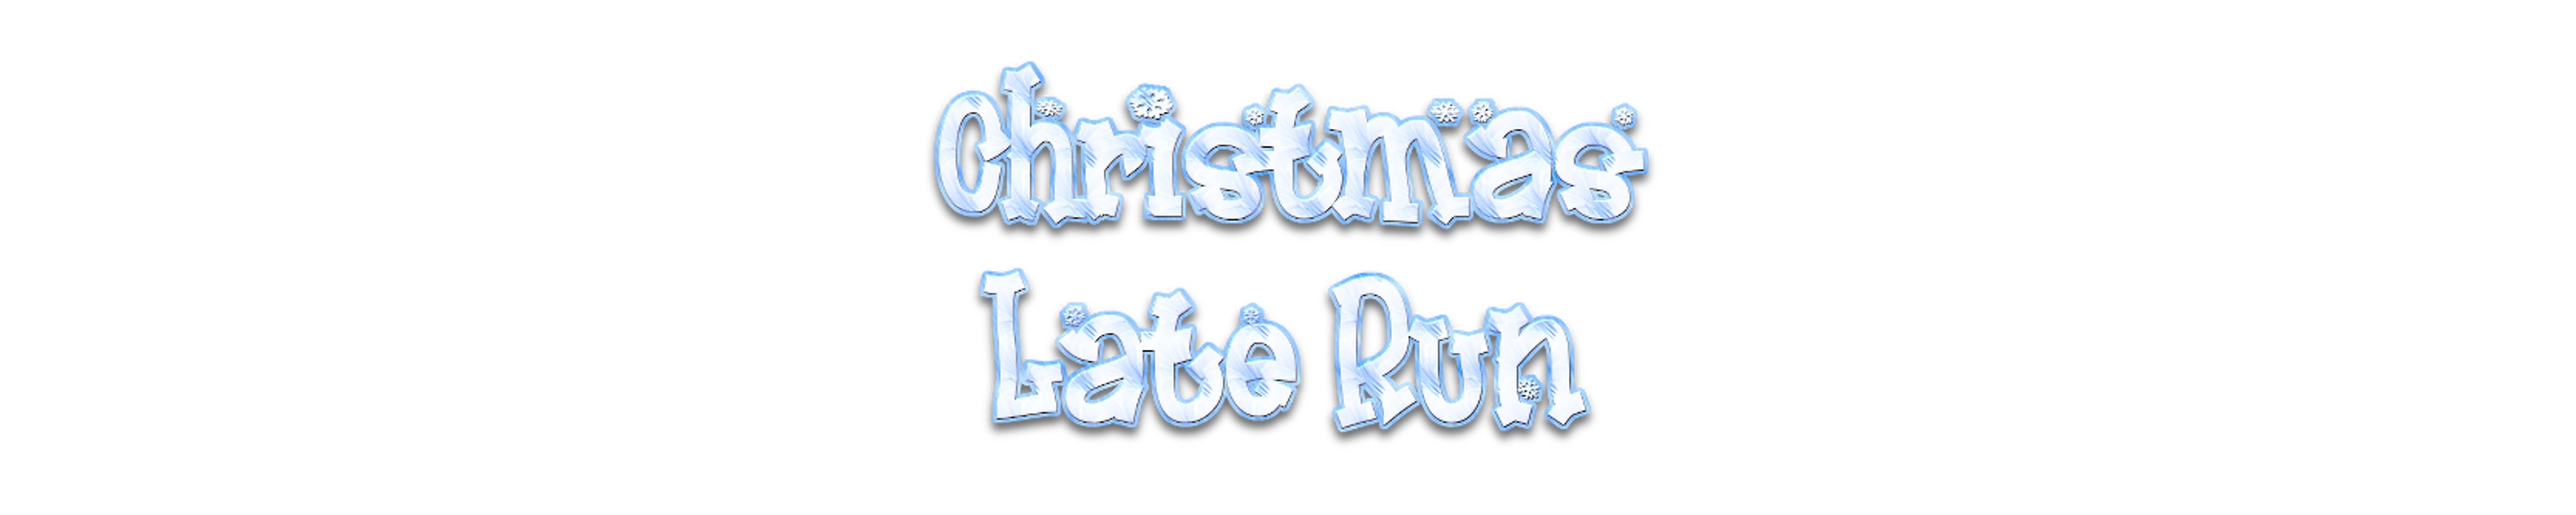 Christmas Late Run